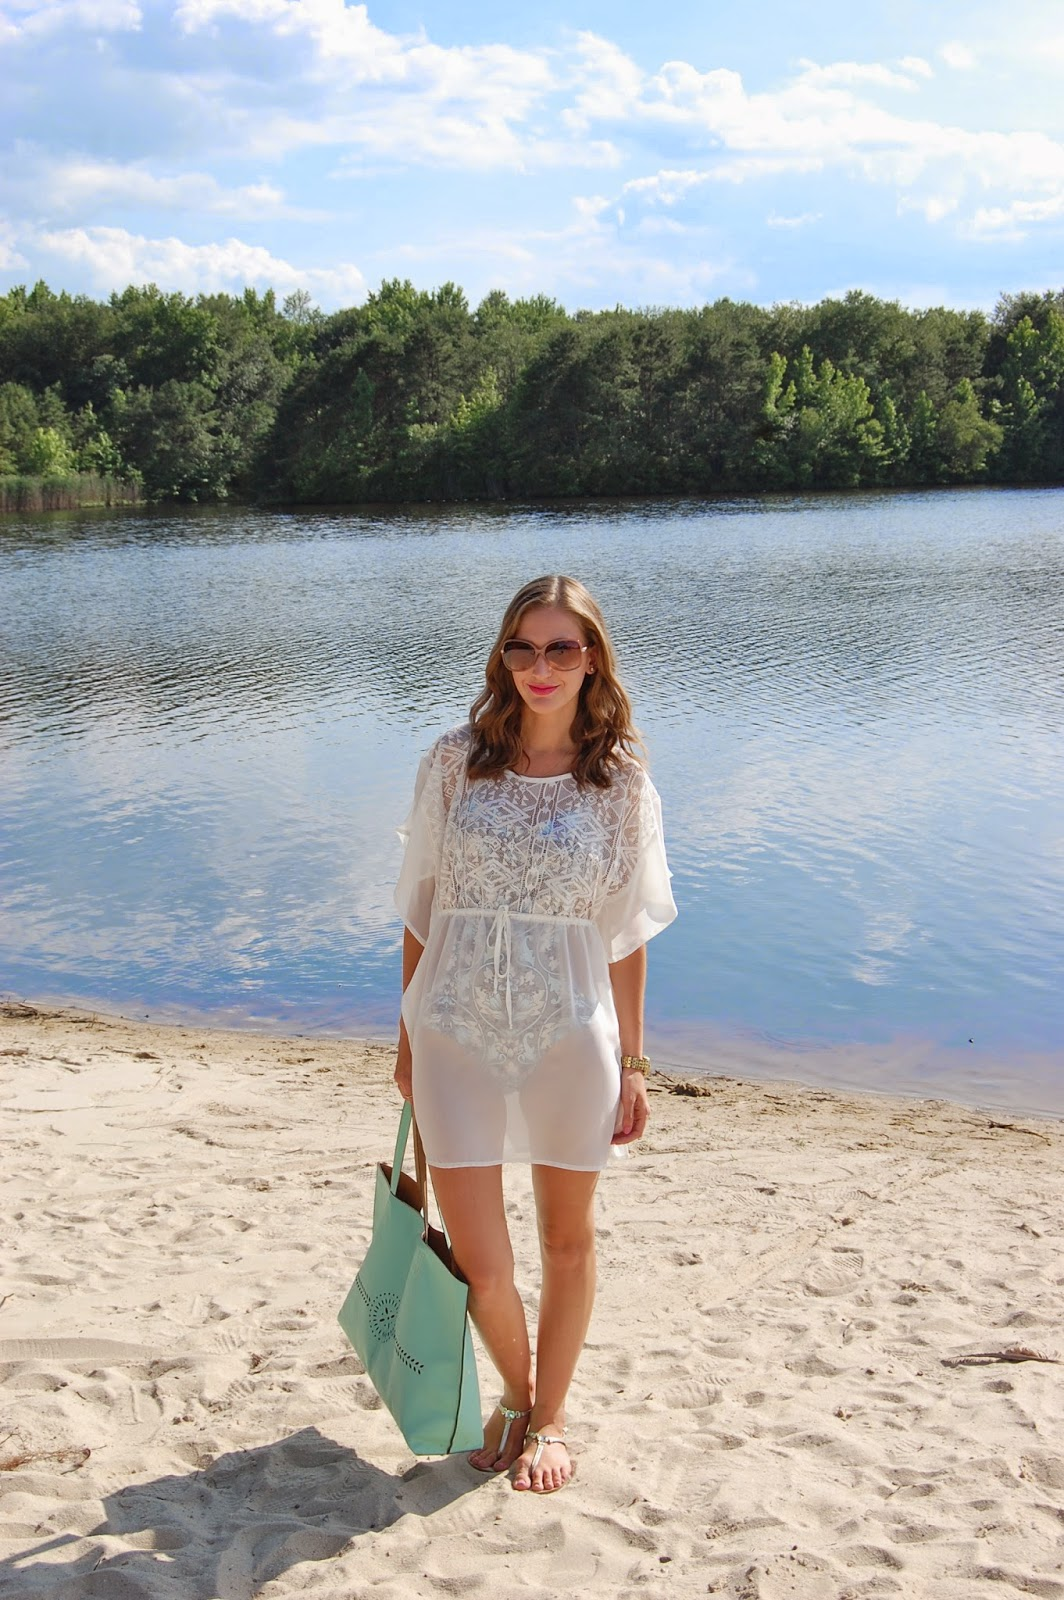 Wearing Wet Swimwear Melissa Swimsuit, Target Xhilaration Coverup swim dress